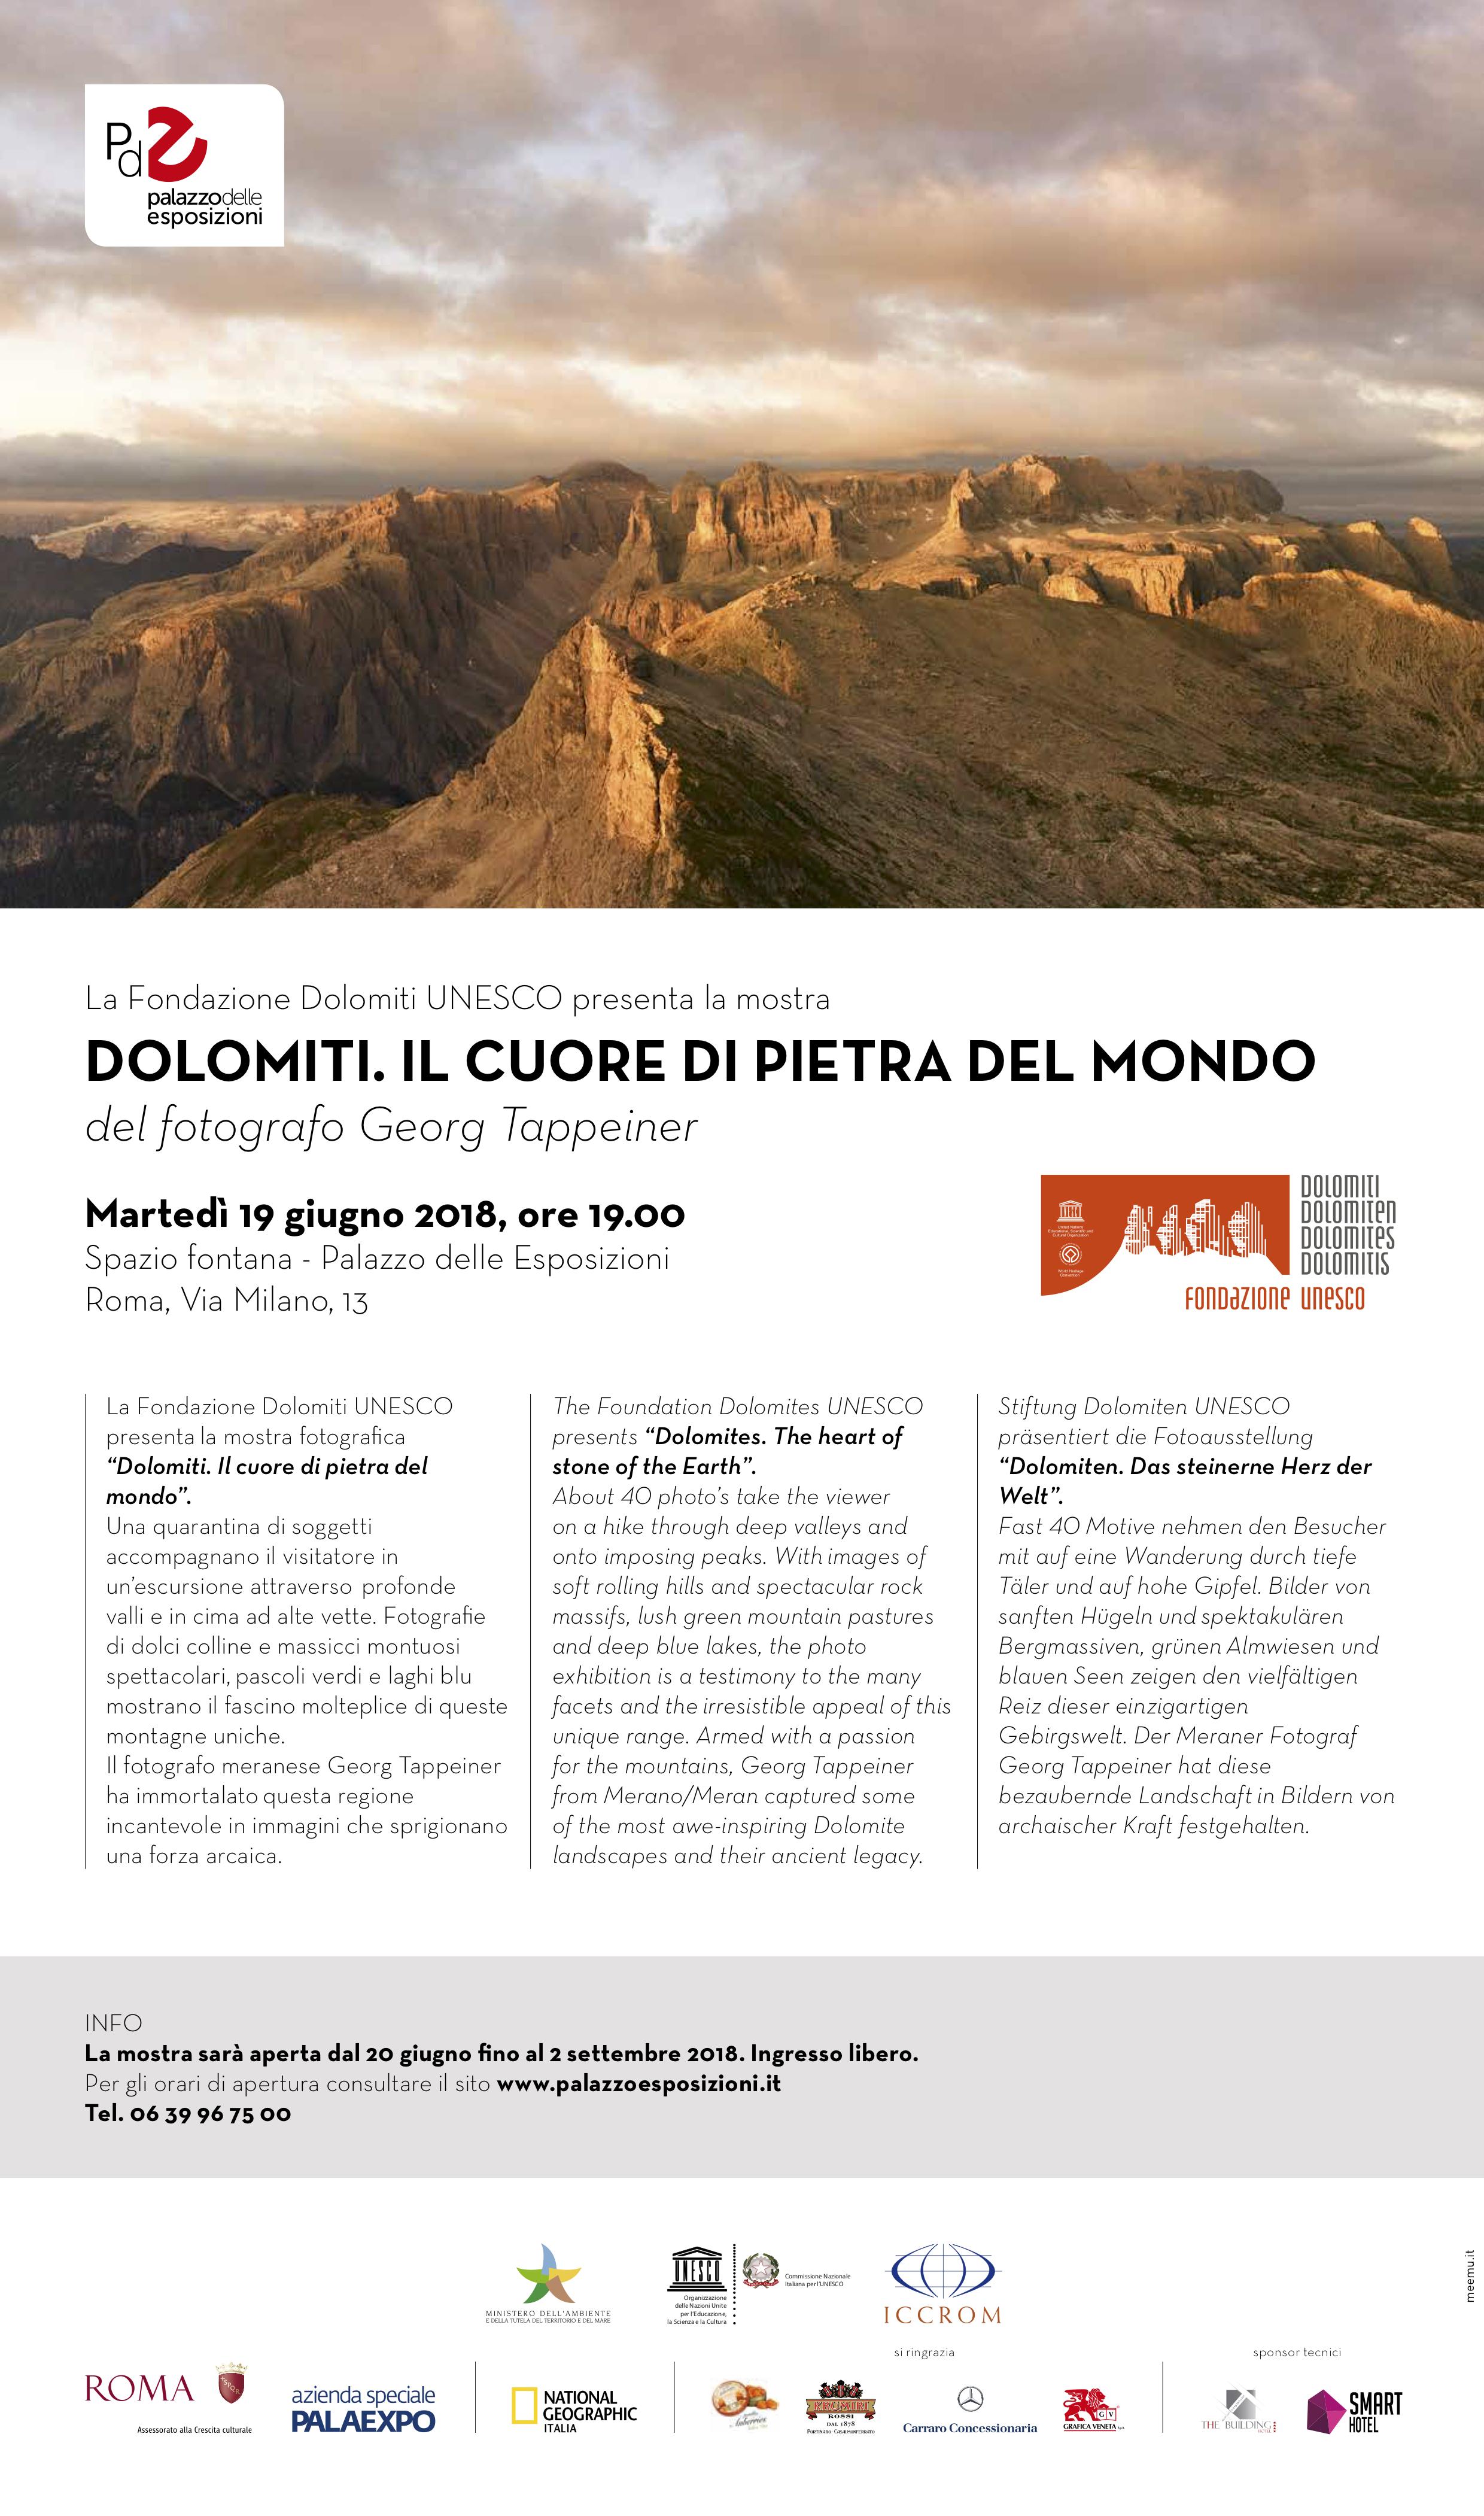 locandina_mostra_dolomiti_roma